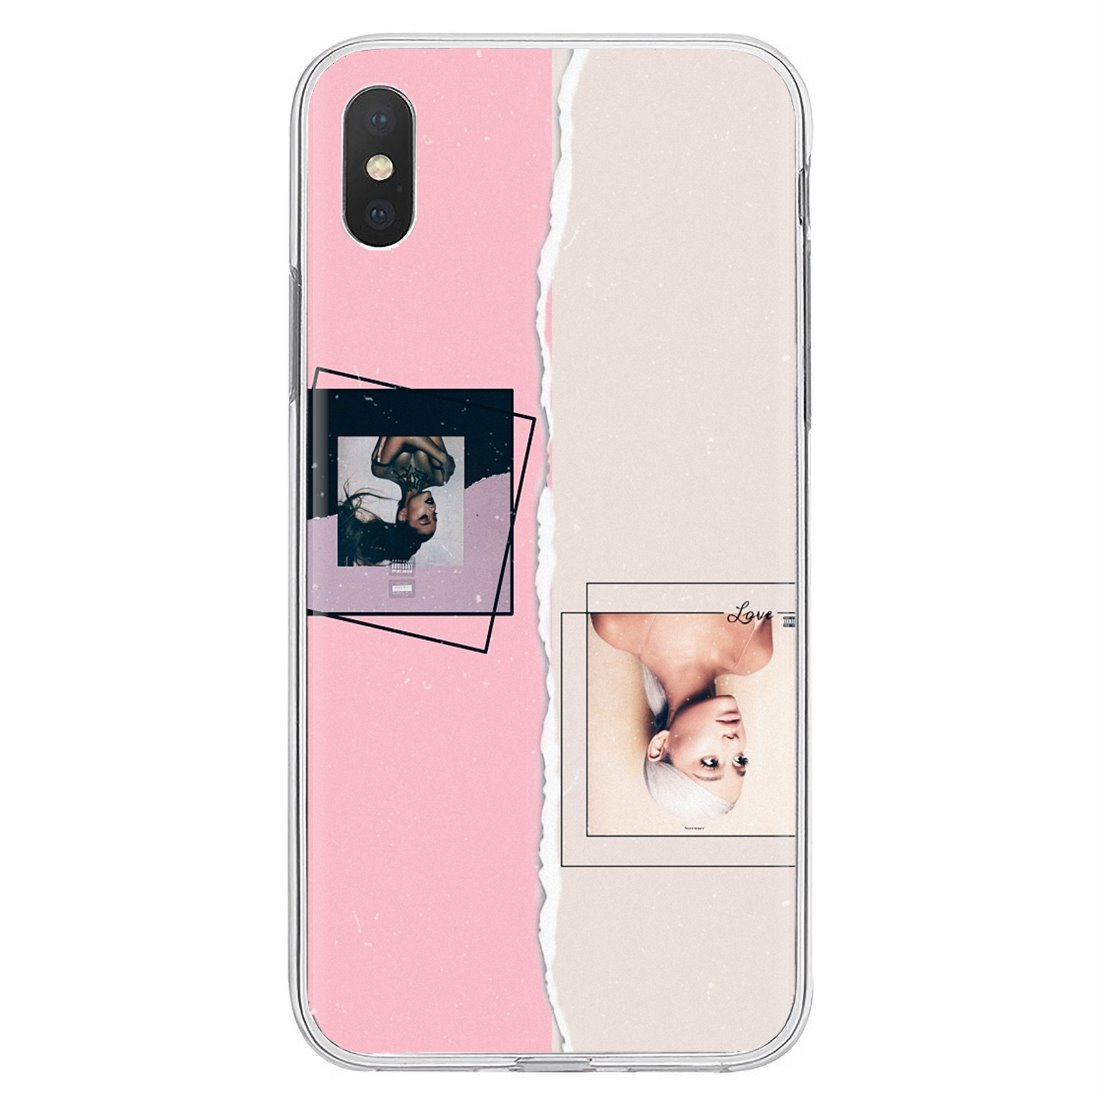 Классический силиконовый чехол для телефона Ariana Grande God Is A Woman для samsung Galaxy A3 A5 A7 A9 A8 Star Lite A6 Plus 2018 2015 2016 2017